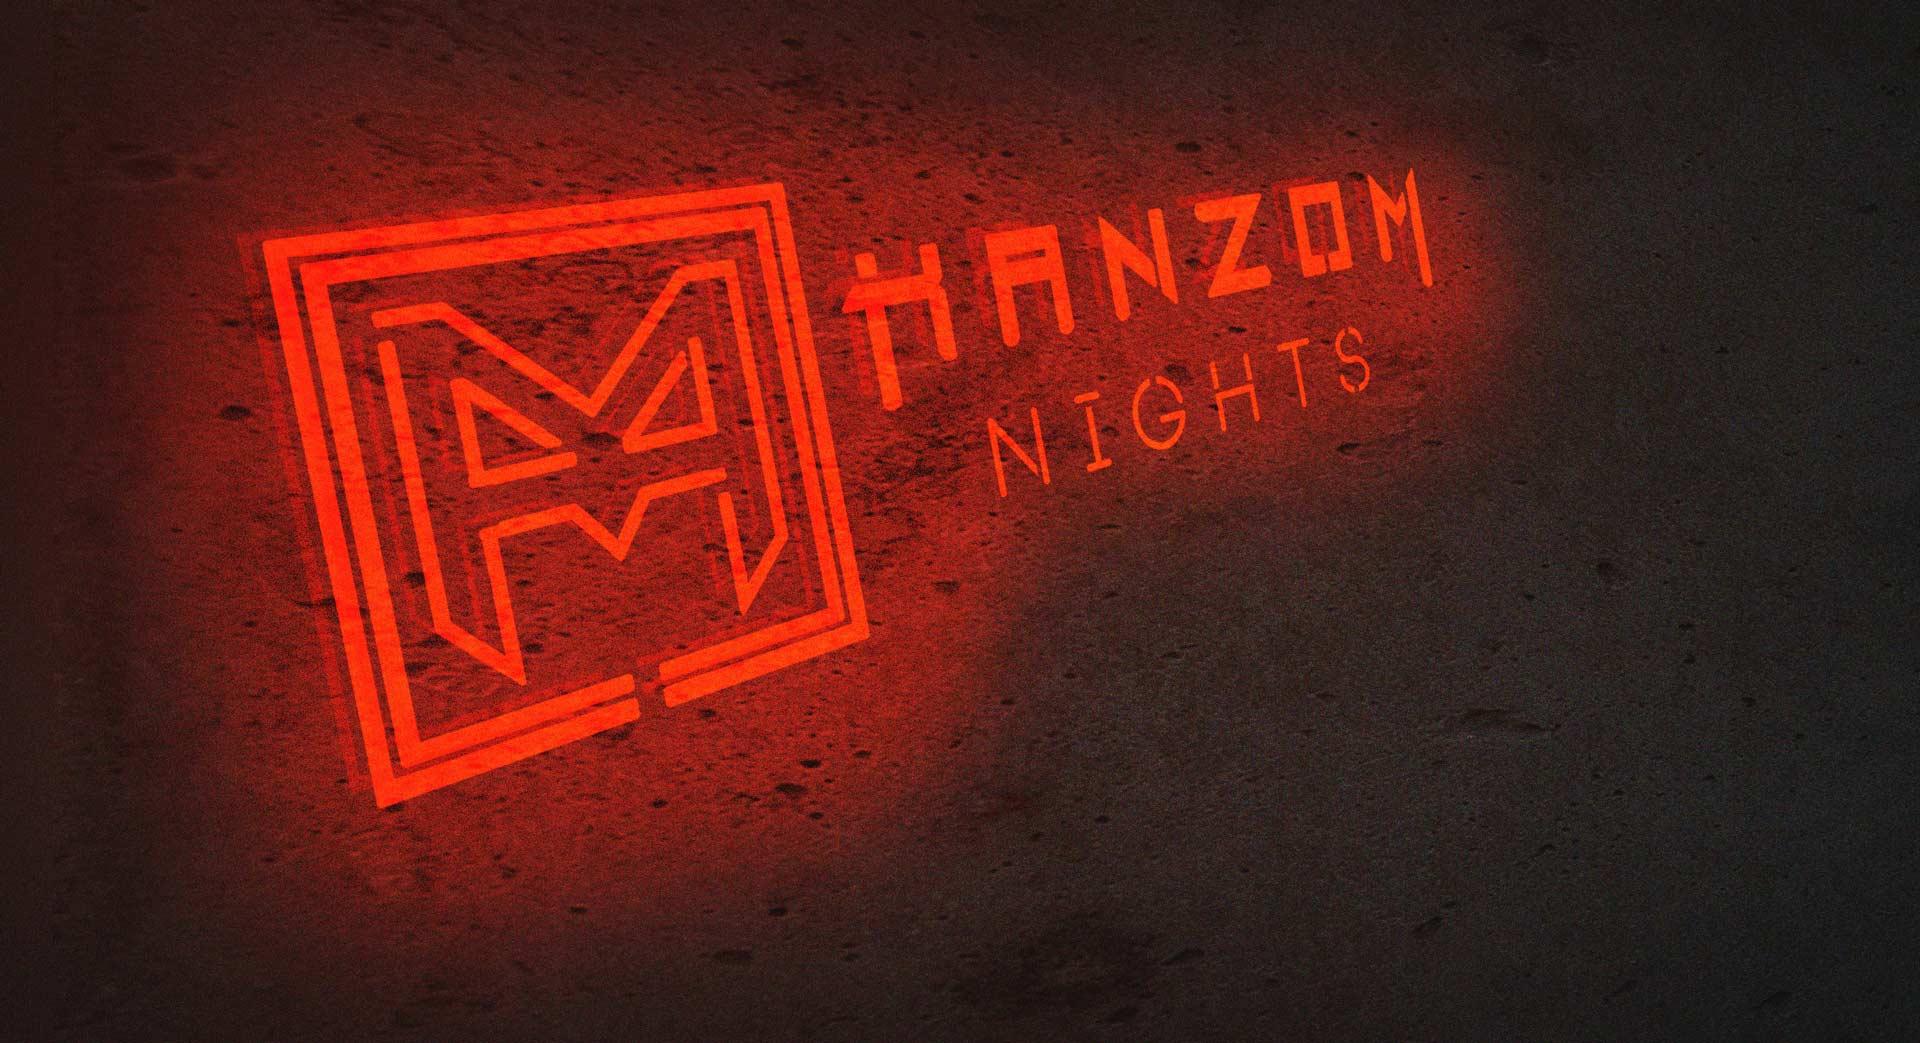 Hanzom Nights vol.1